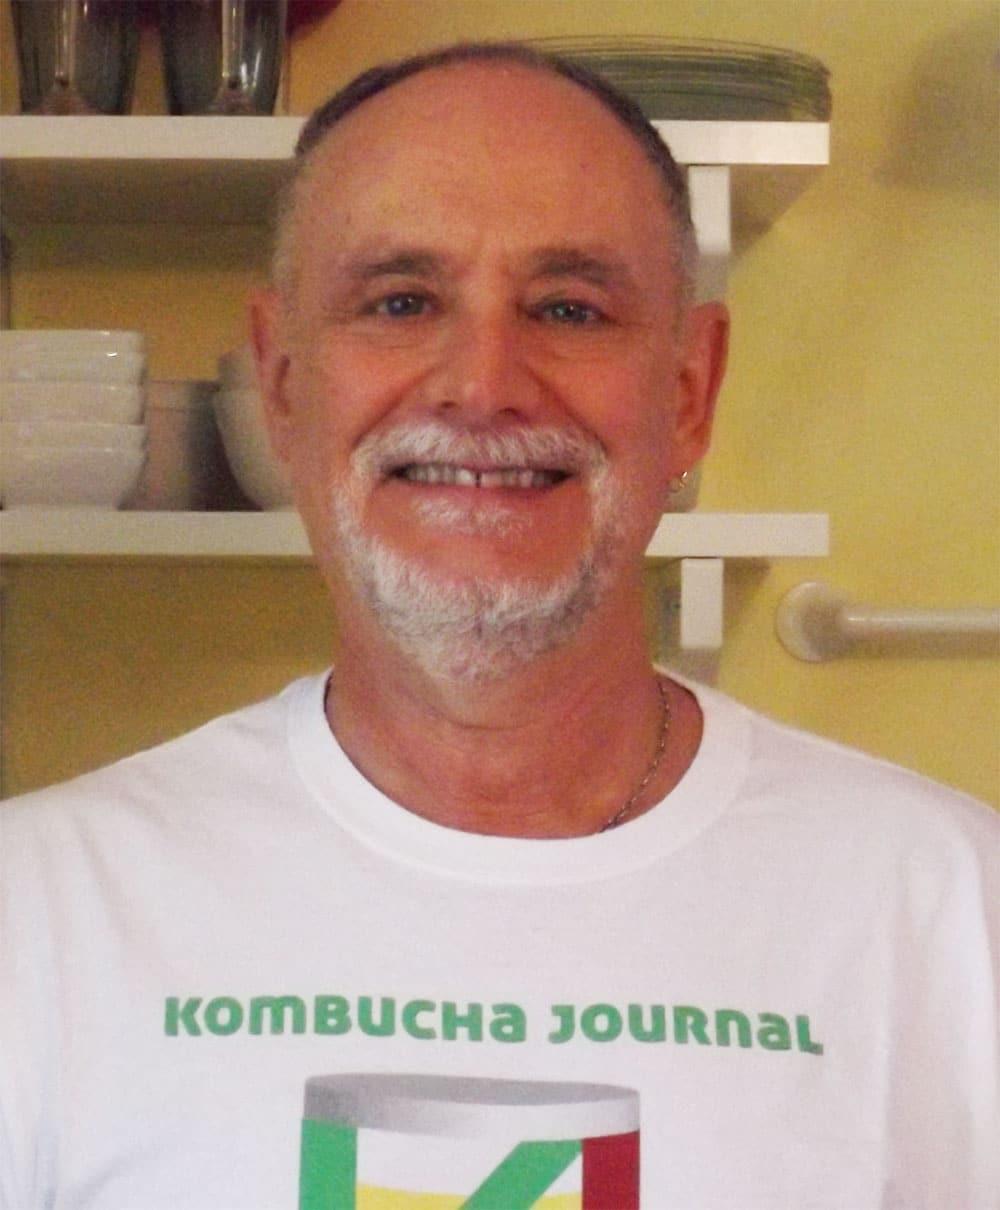 Neil of kombuchajournal.com